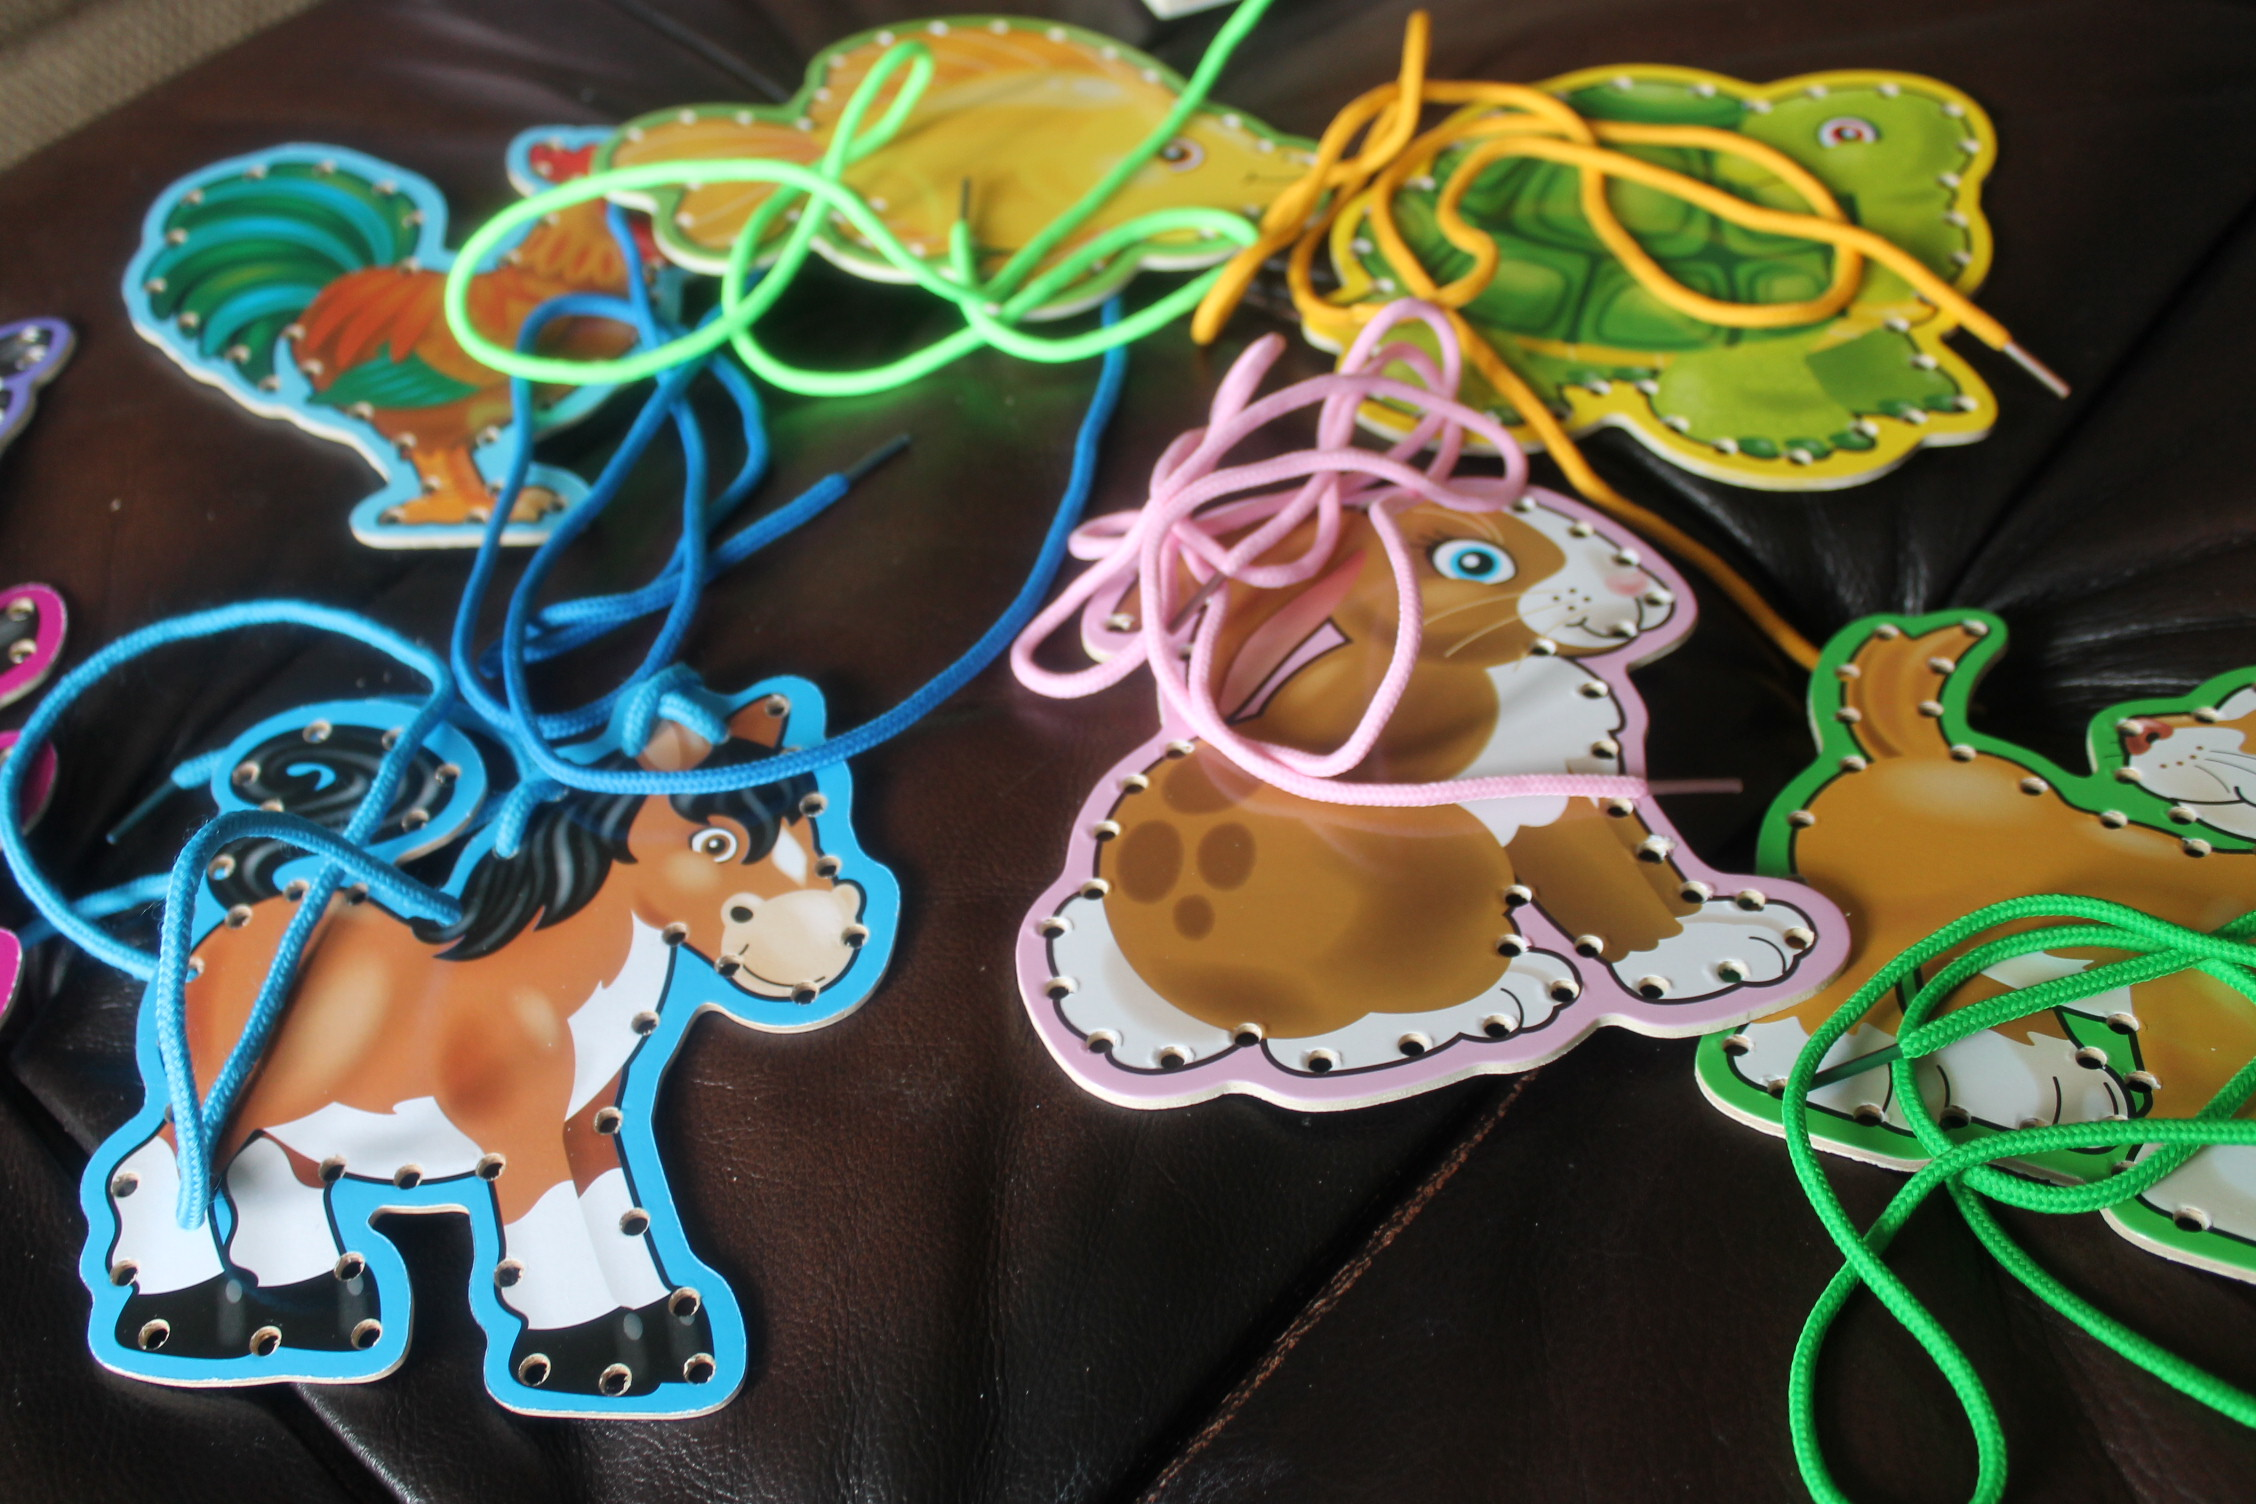 Melissa Amp Doug Lace Amp Trace Pets And Farm Animals